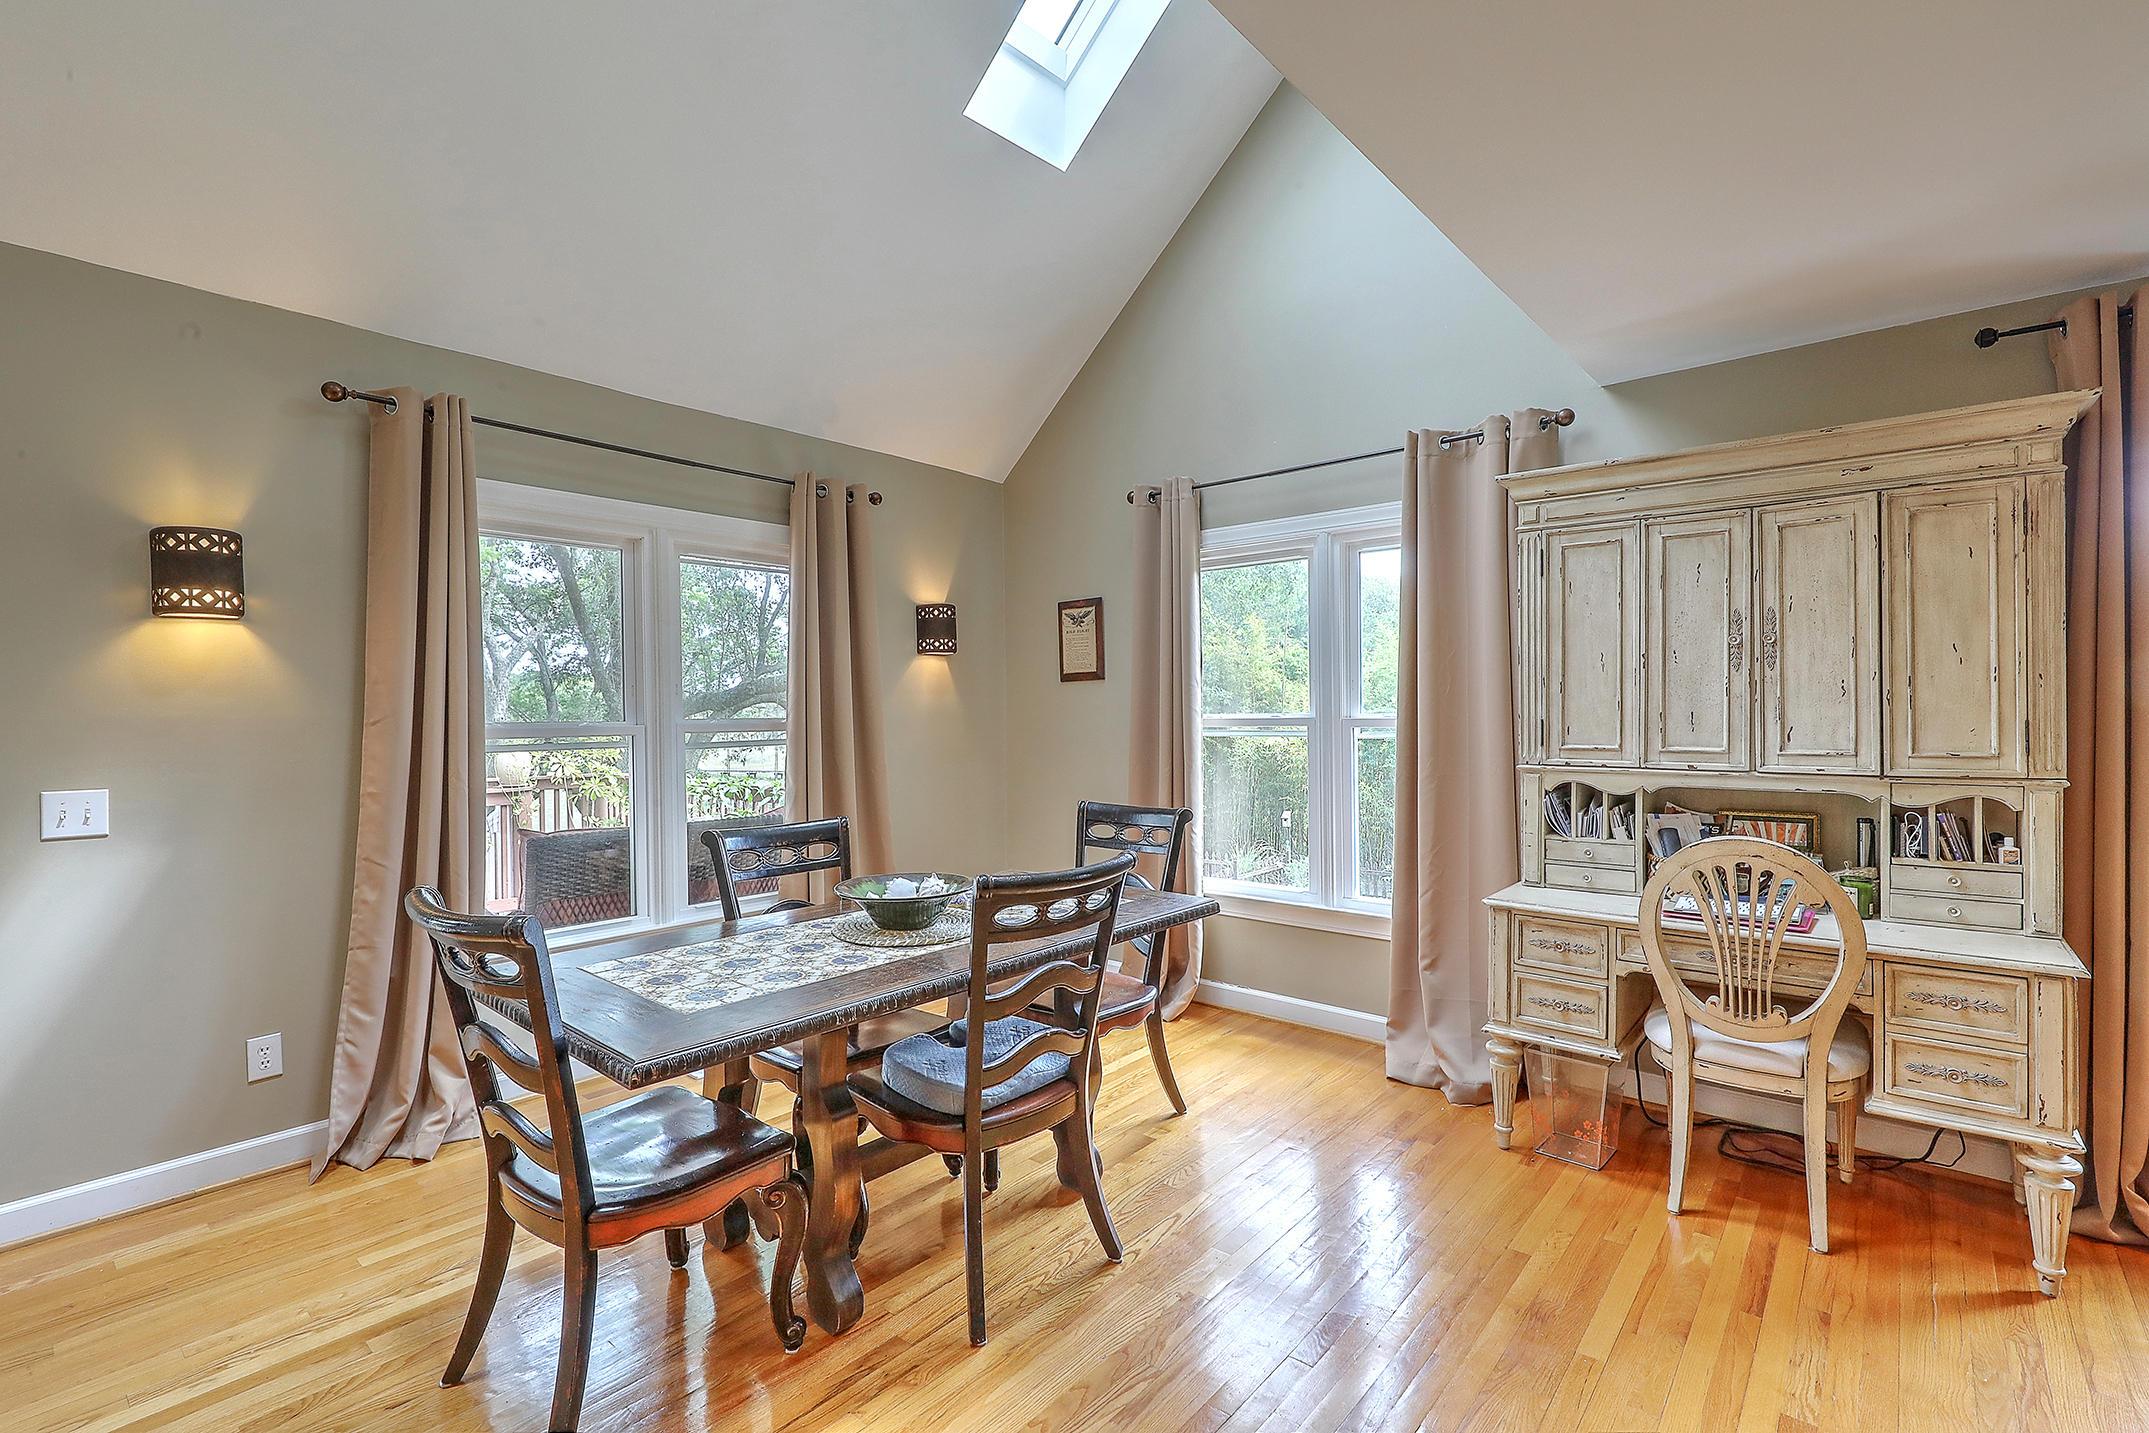 Stono Pointe Homes For Sale - 2660 Burden Creek, Johns Island, SC - 62